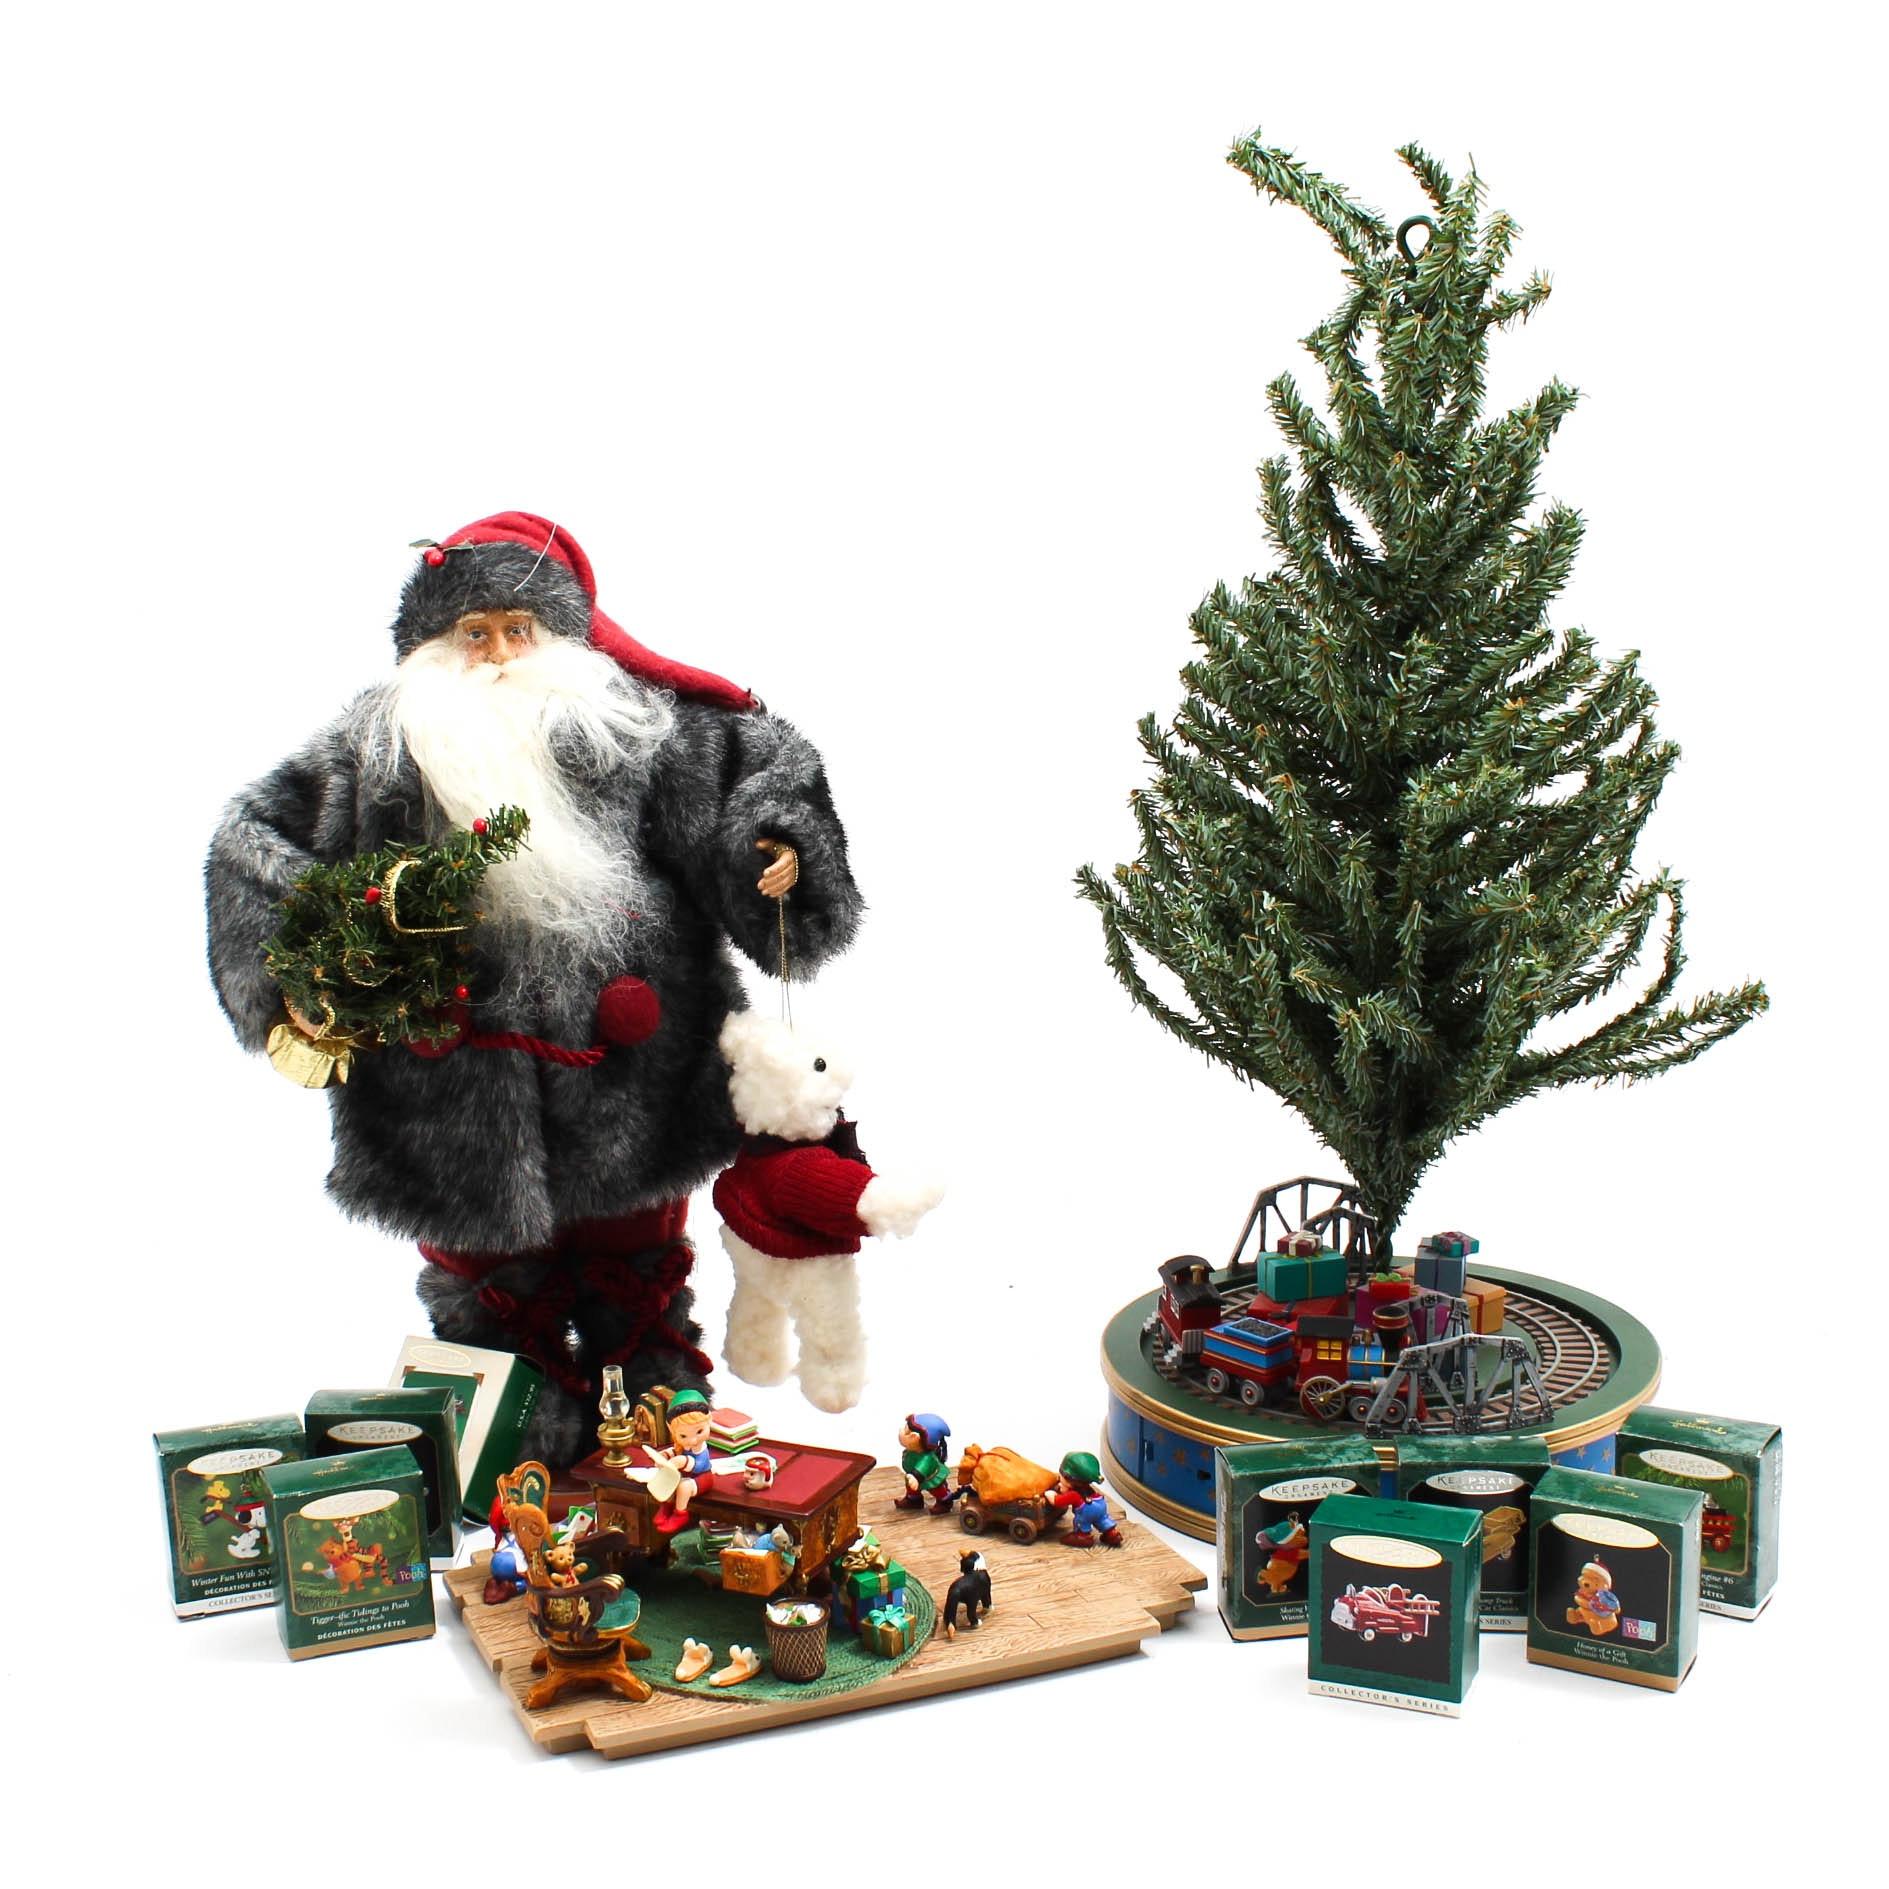 Christmas Decorations with Hallmark Train and Santa's Desk